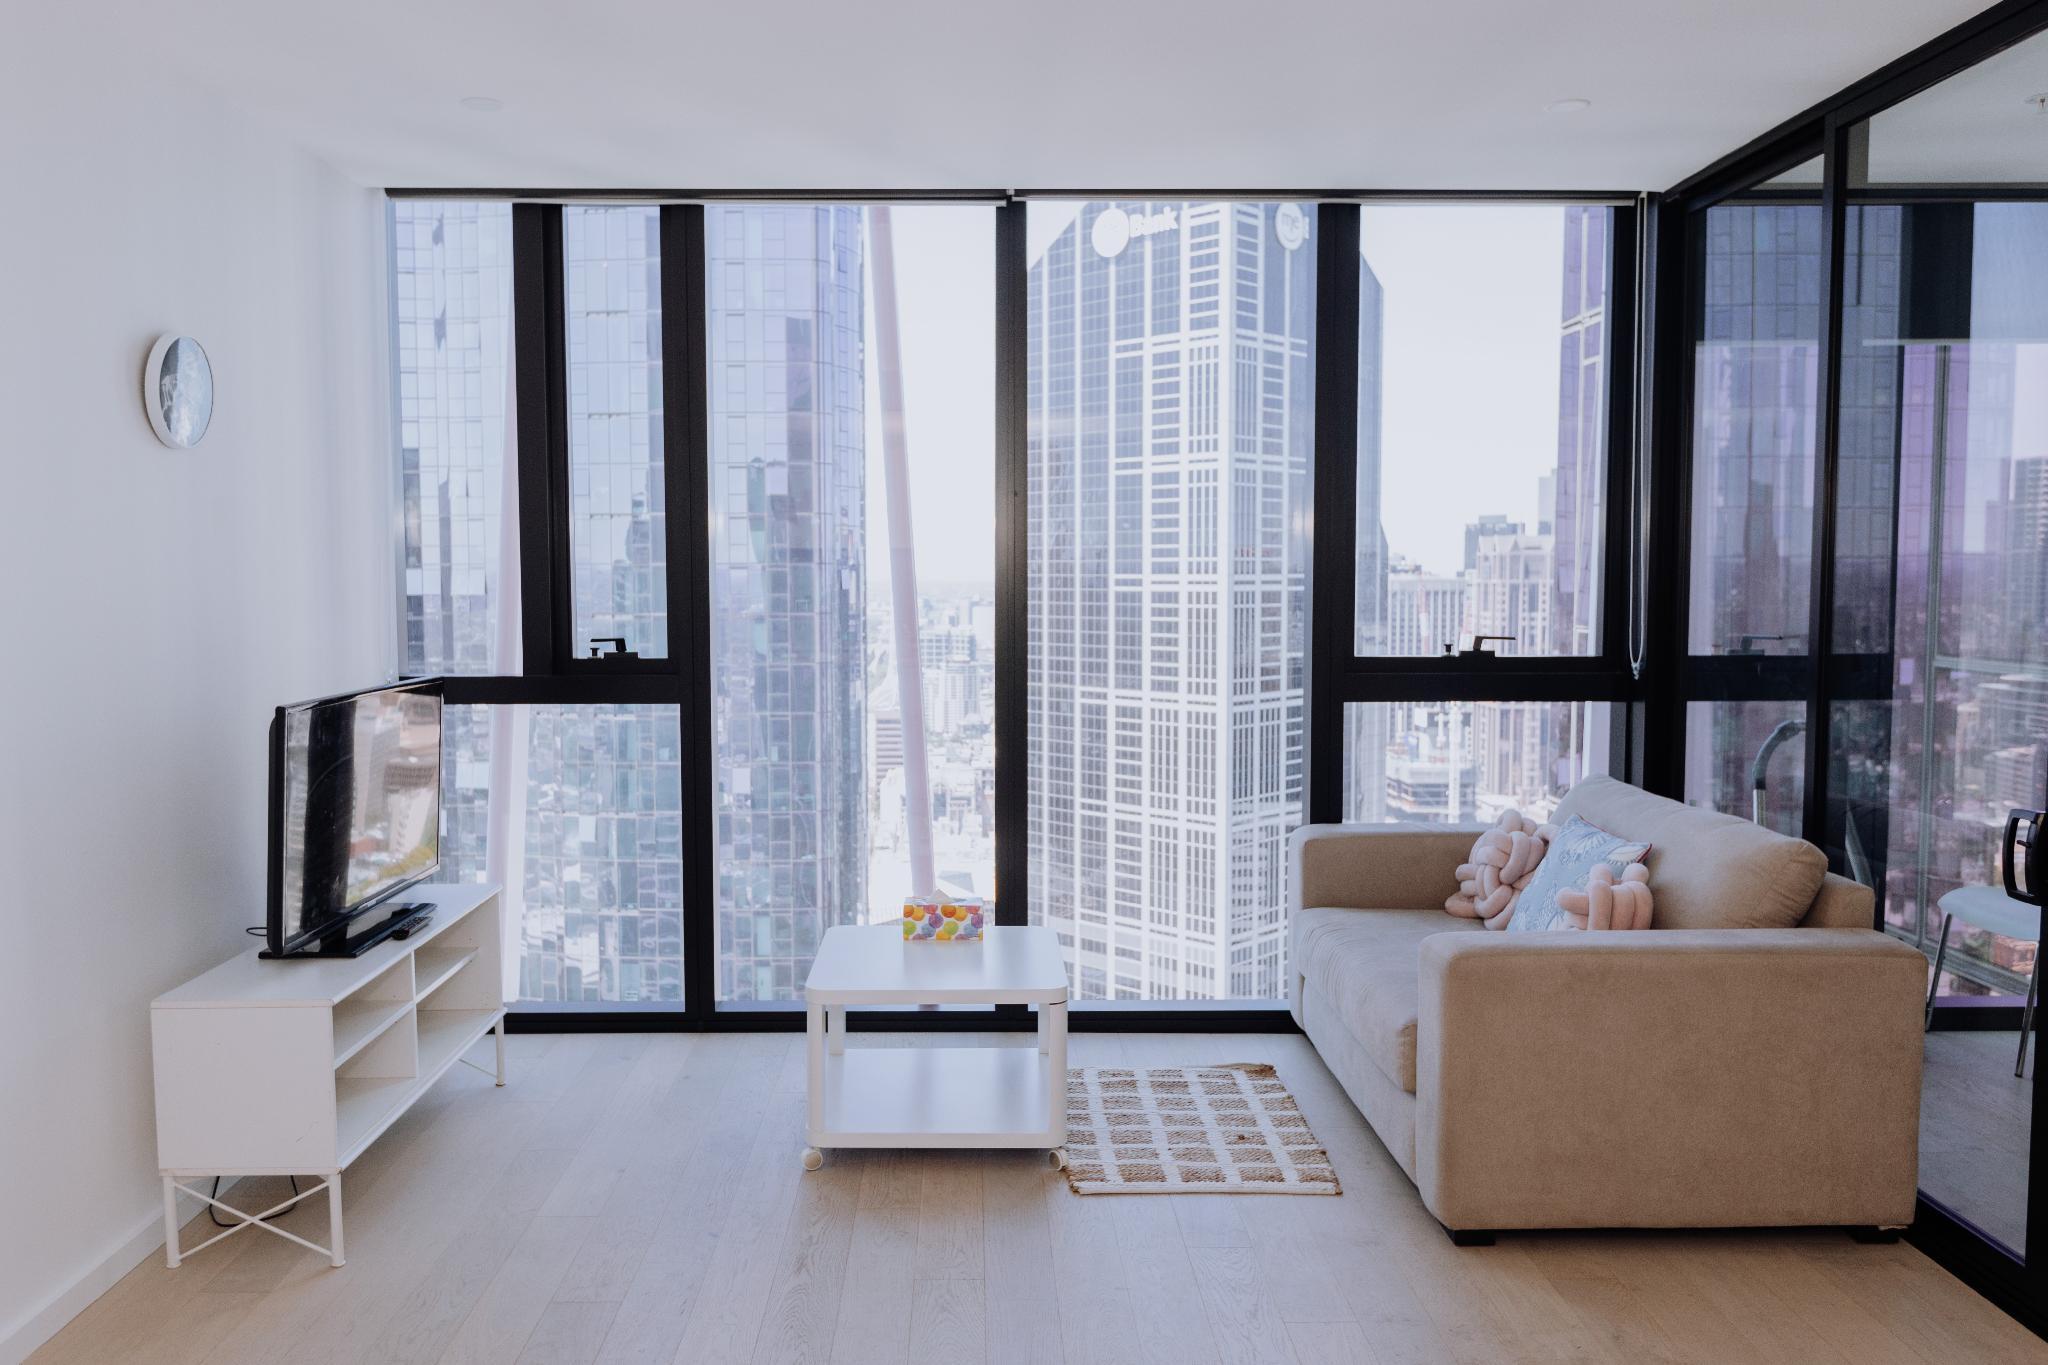 Luxurious APT CBD View Share With Avani Hotel